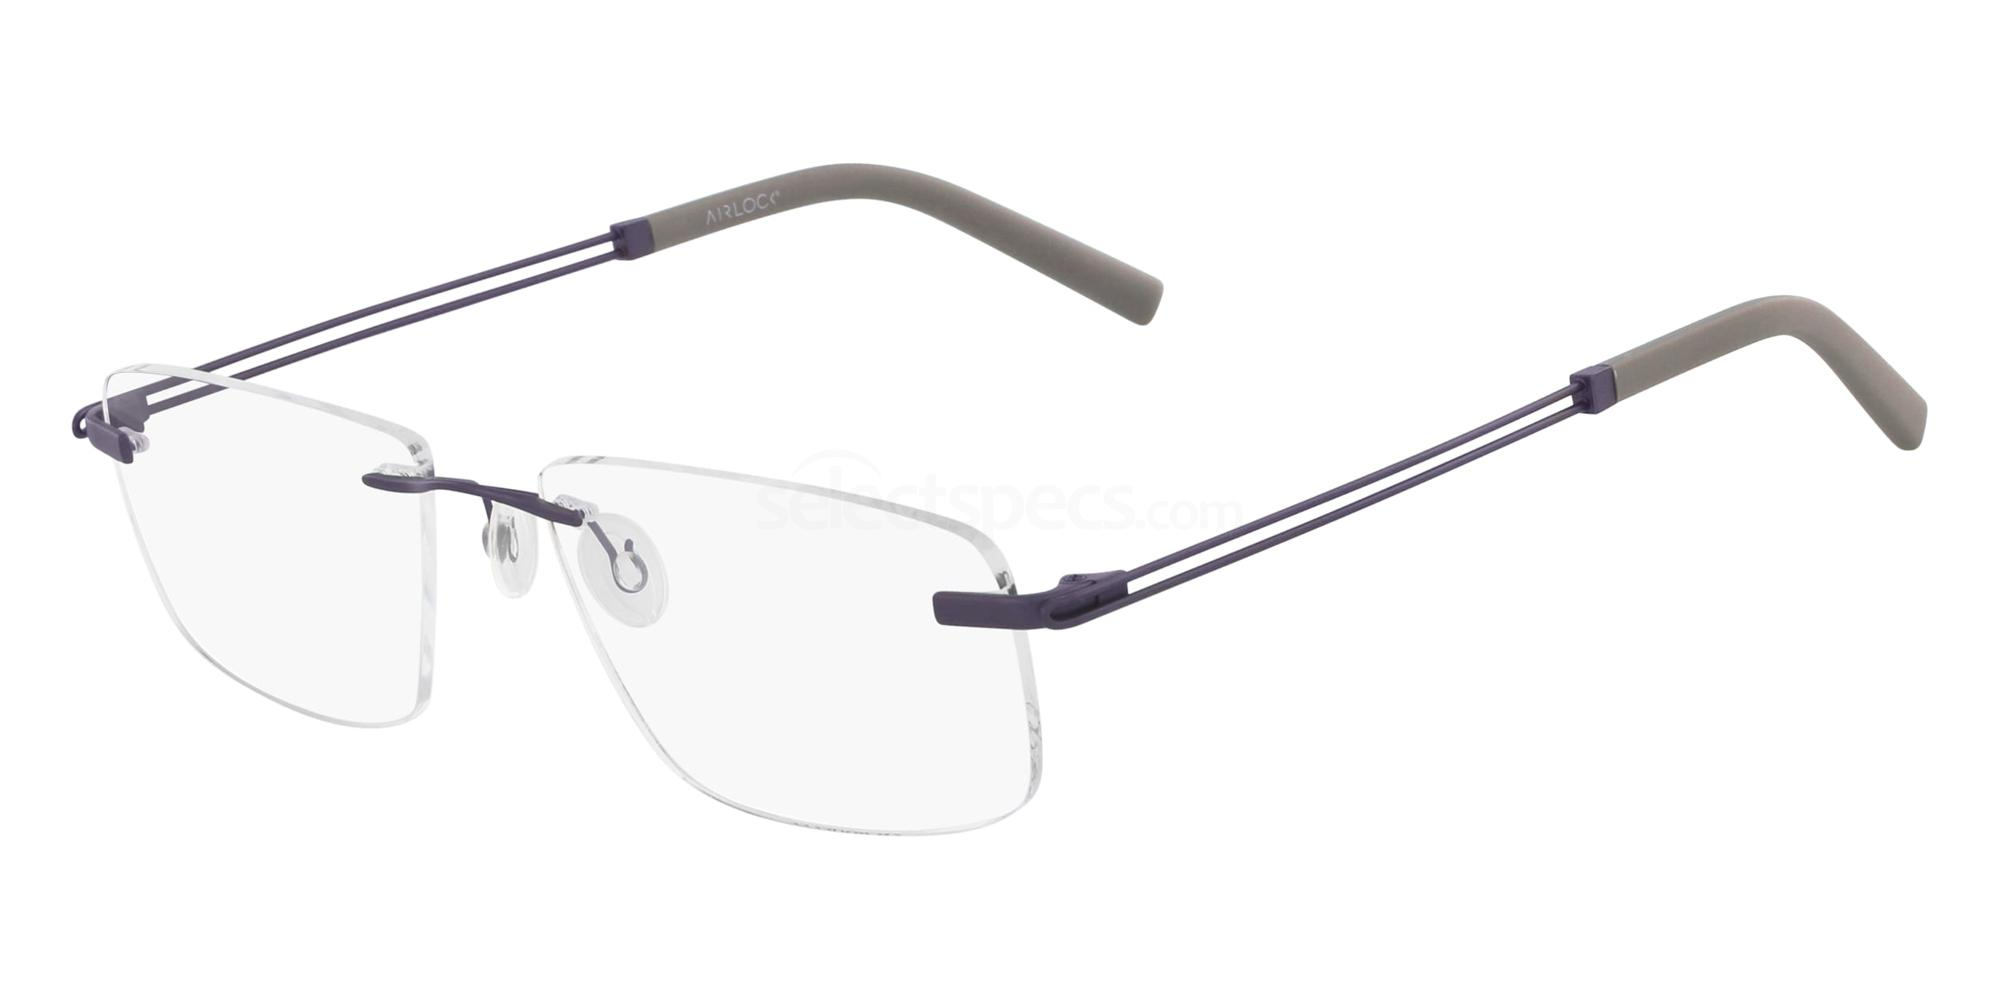 412 DIGNITY 204 Glasses, AIRLOCK